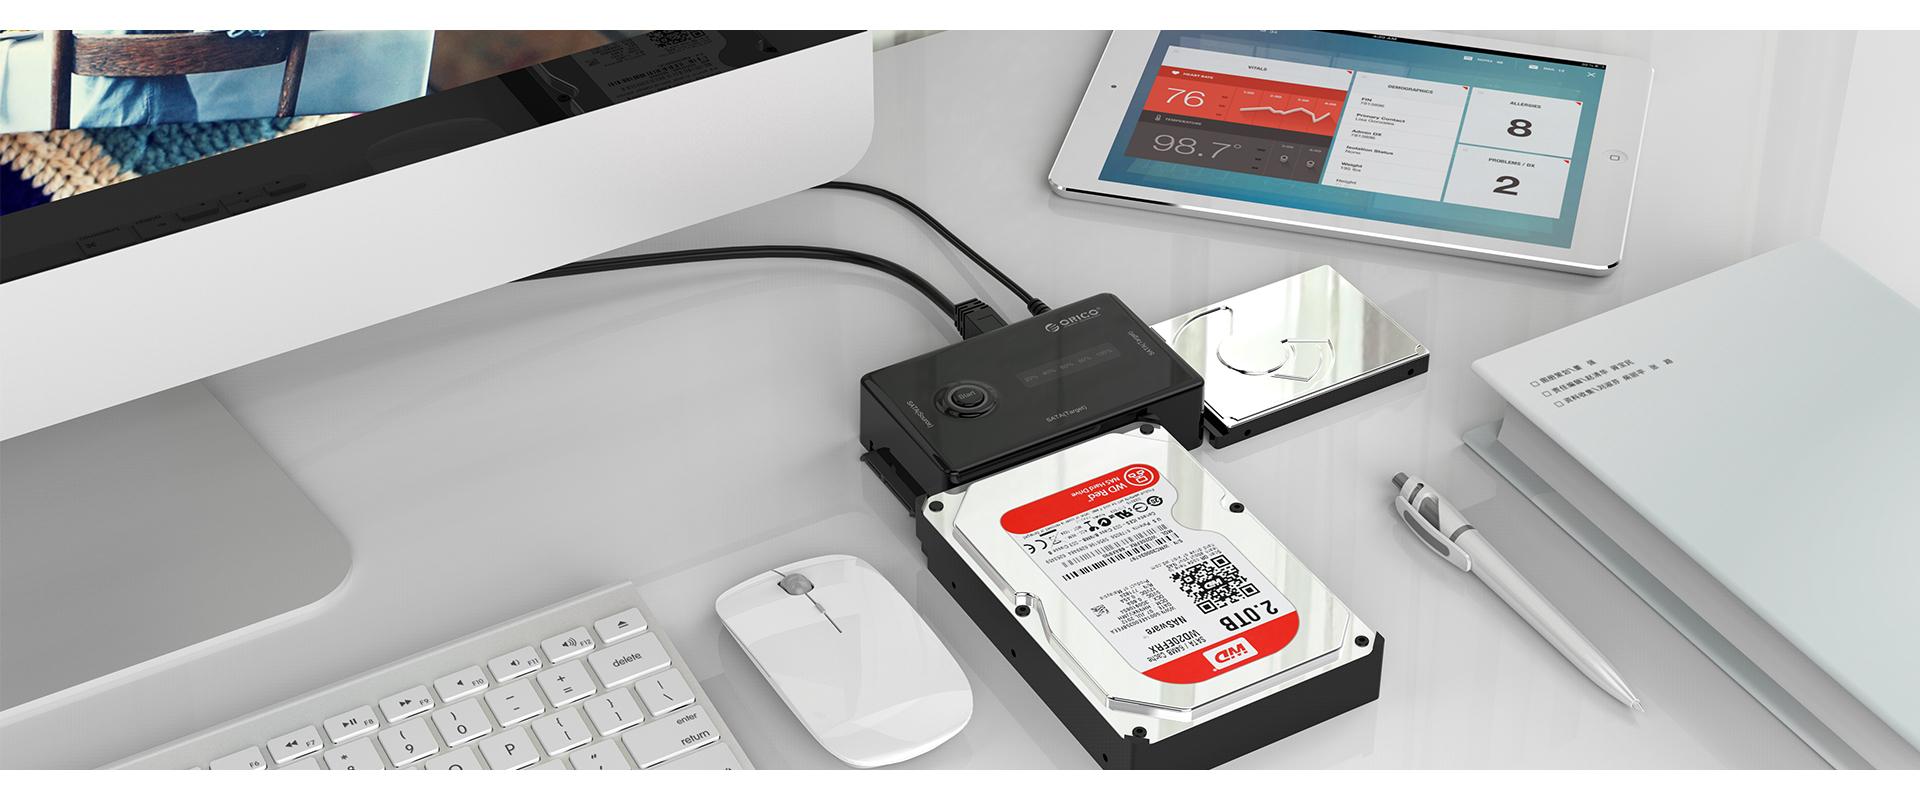 ORICO USB3.0 2.5 & 3.5 inch SATA External Hard Drive Duplicator Adapter